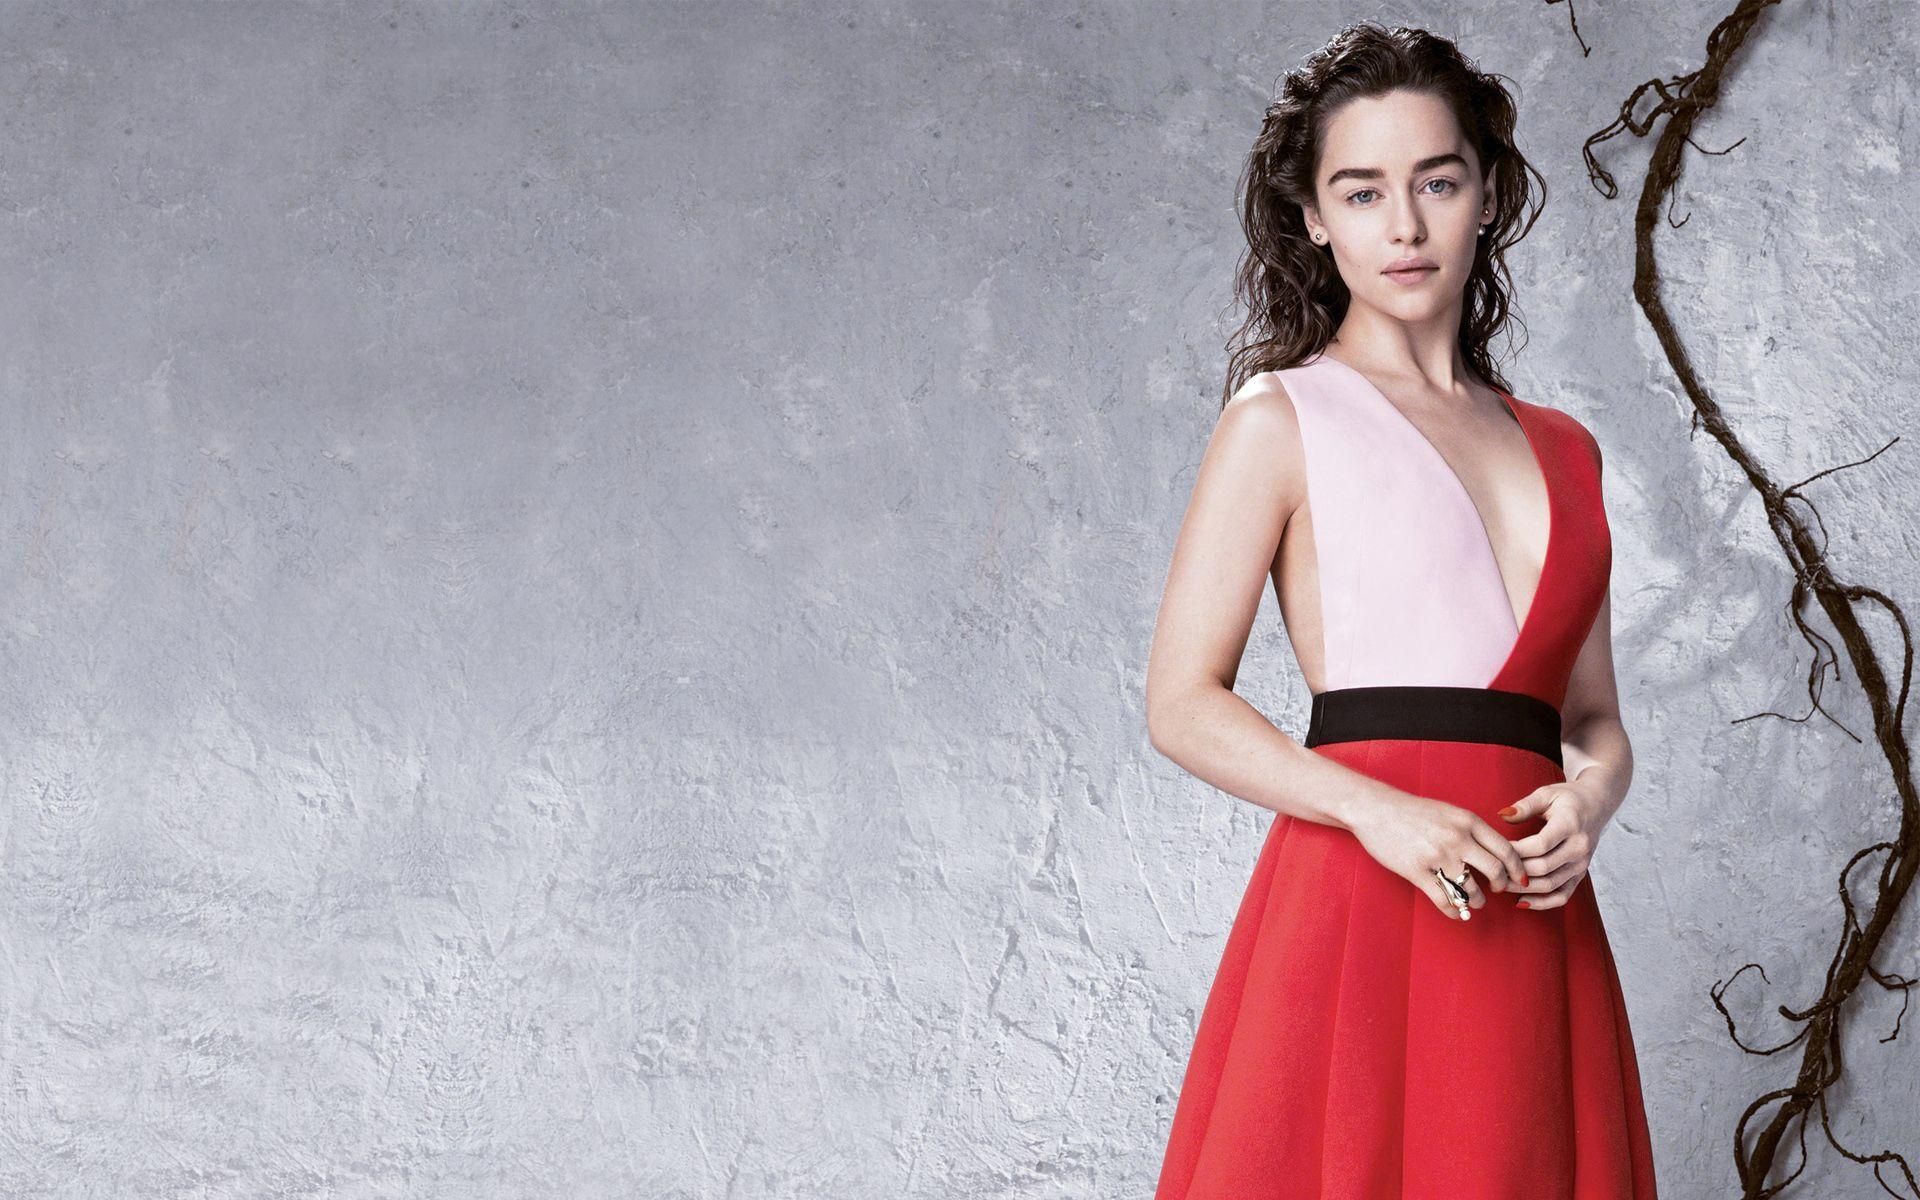 Emilia Clarke HD Wallpapers - Wallpaper Cave